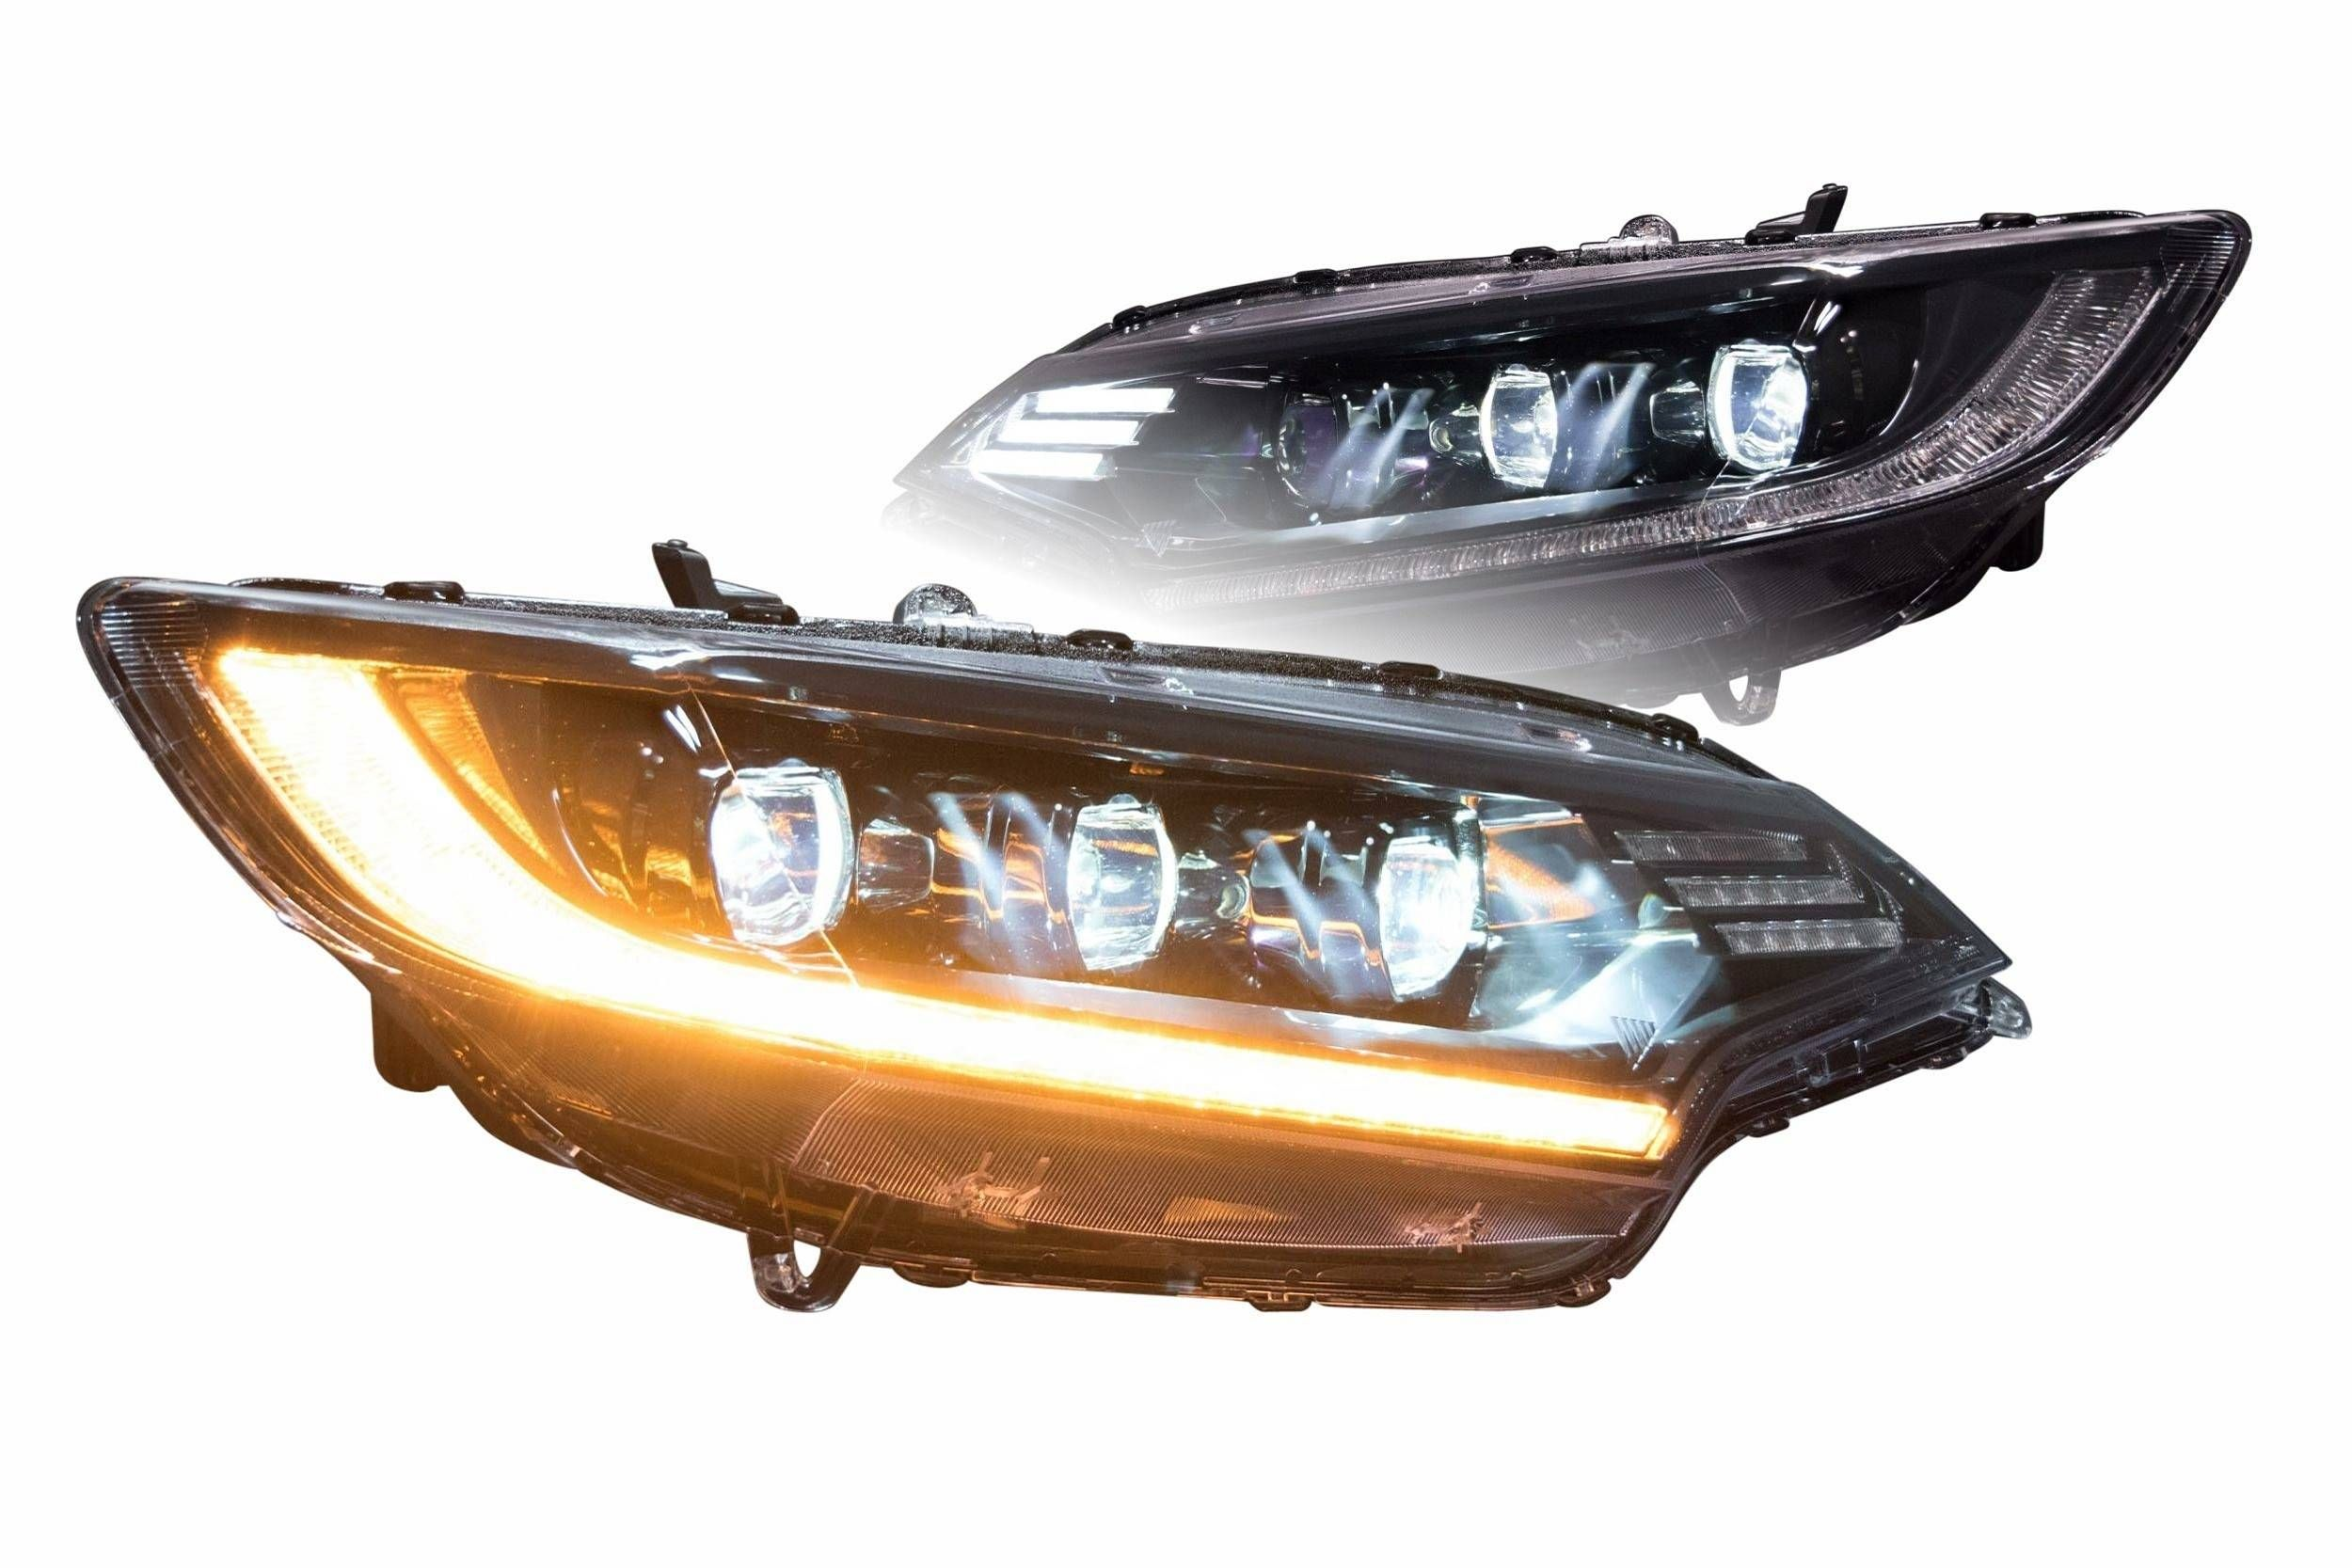 Ad Ebay Fits 07 13 Silverado Pickup Truck Smoked Smoke Led Tail Lights Rear Brake Lamps Led Tail Lights Pickup Trucks Rear Brakes